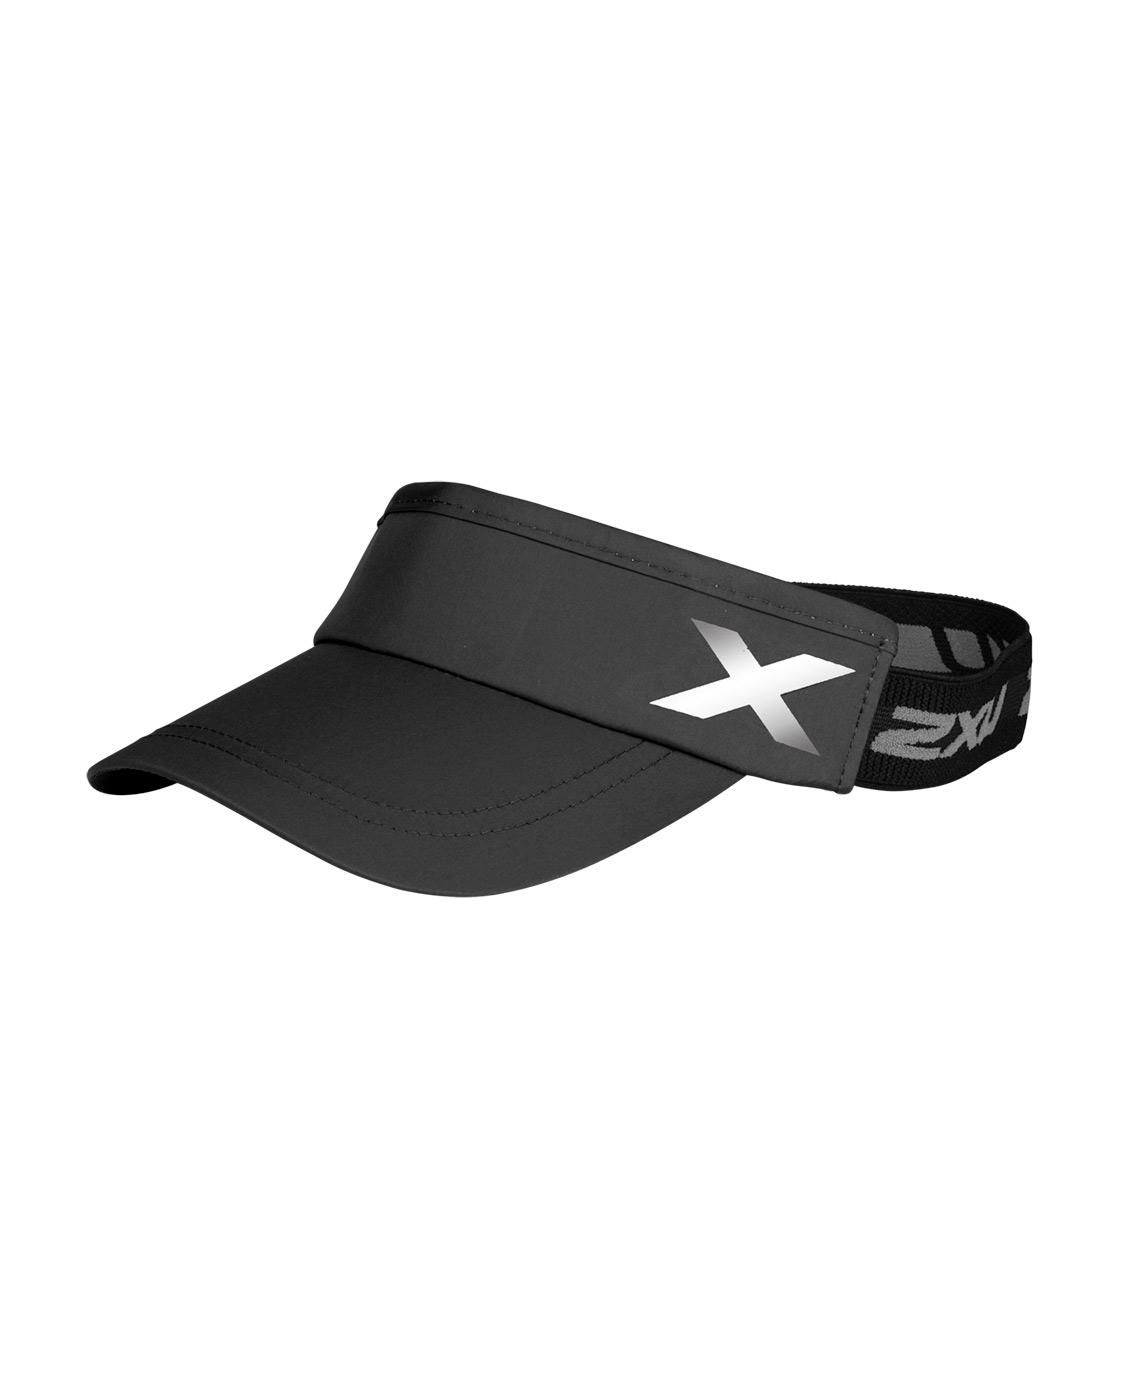 2XU Unisex Performance Visor - Black/Black